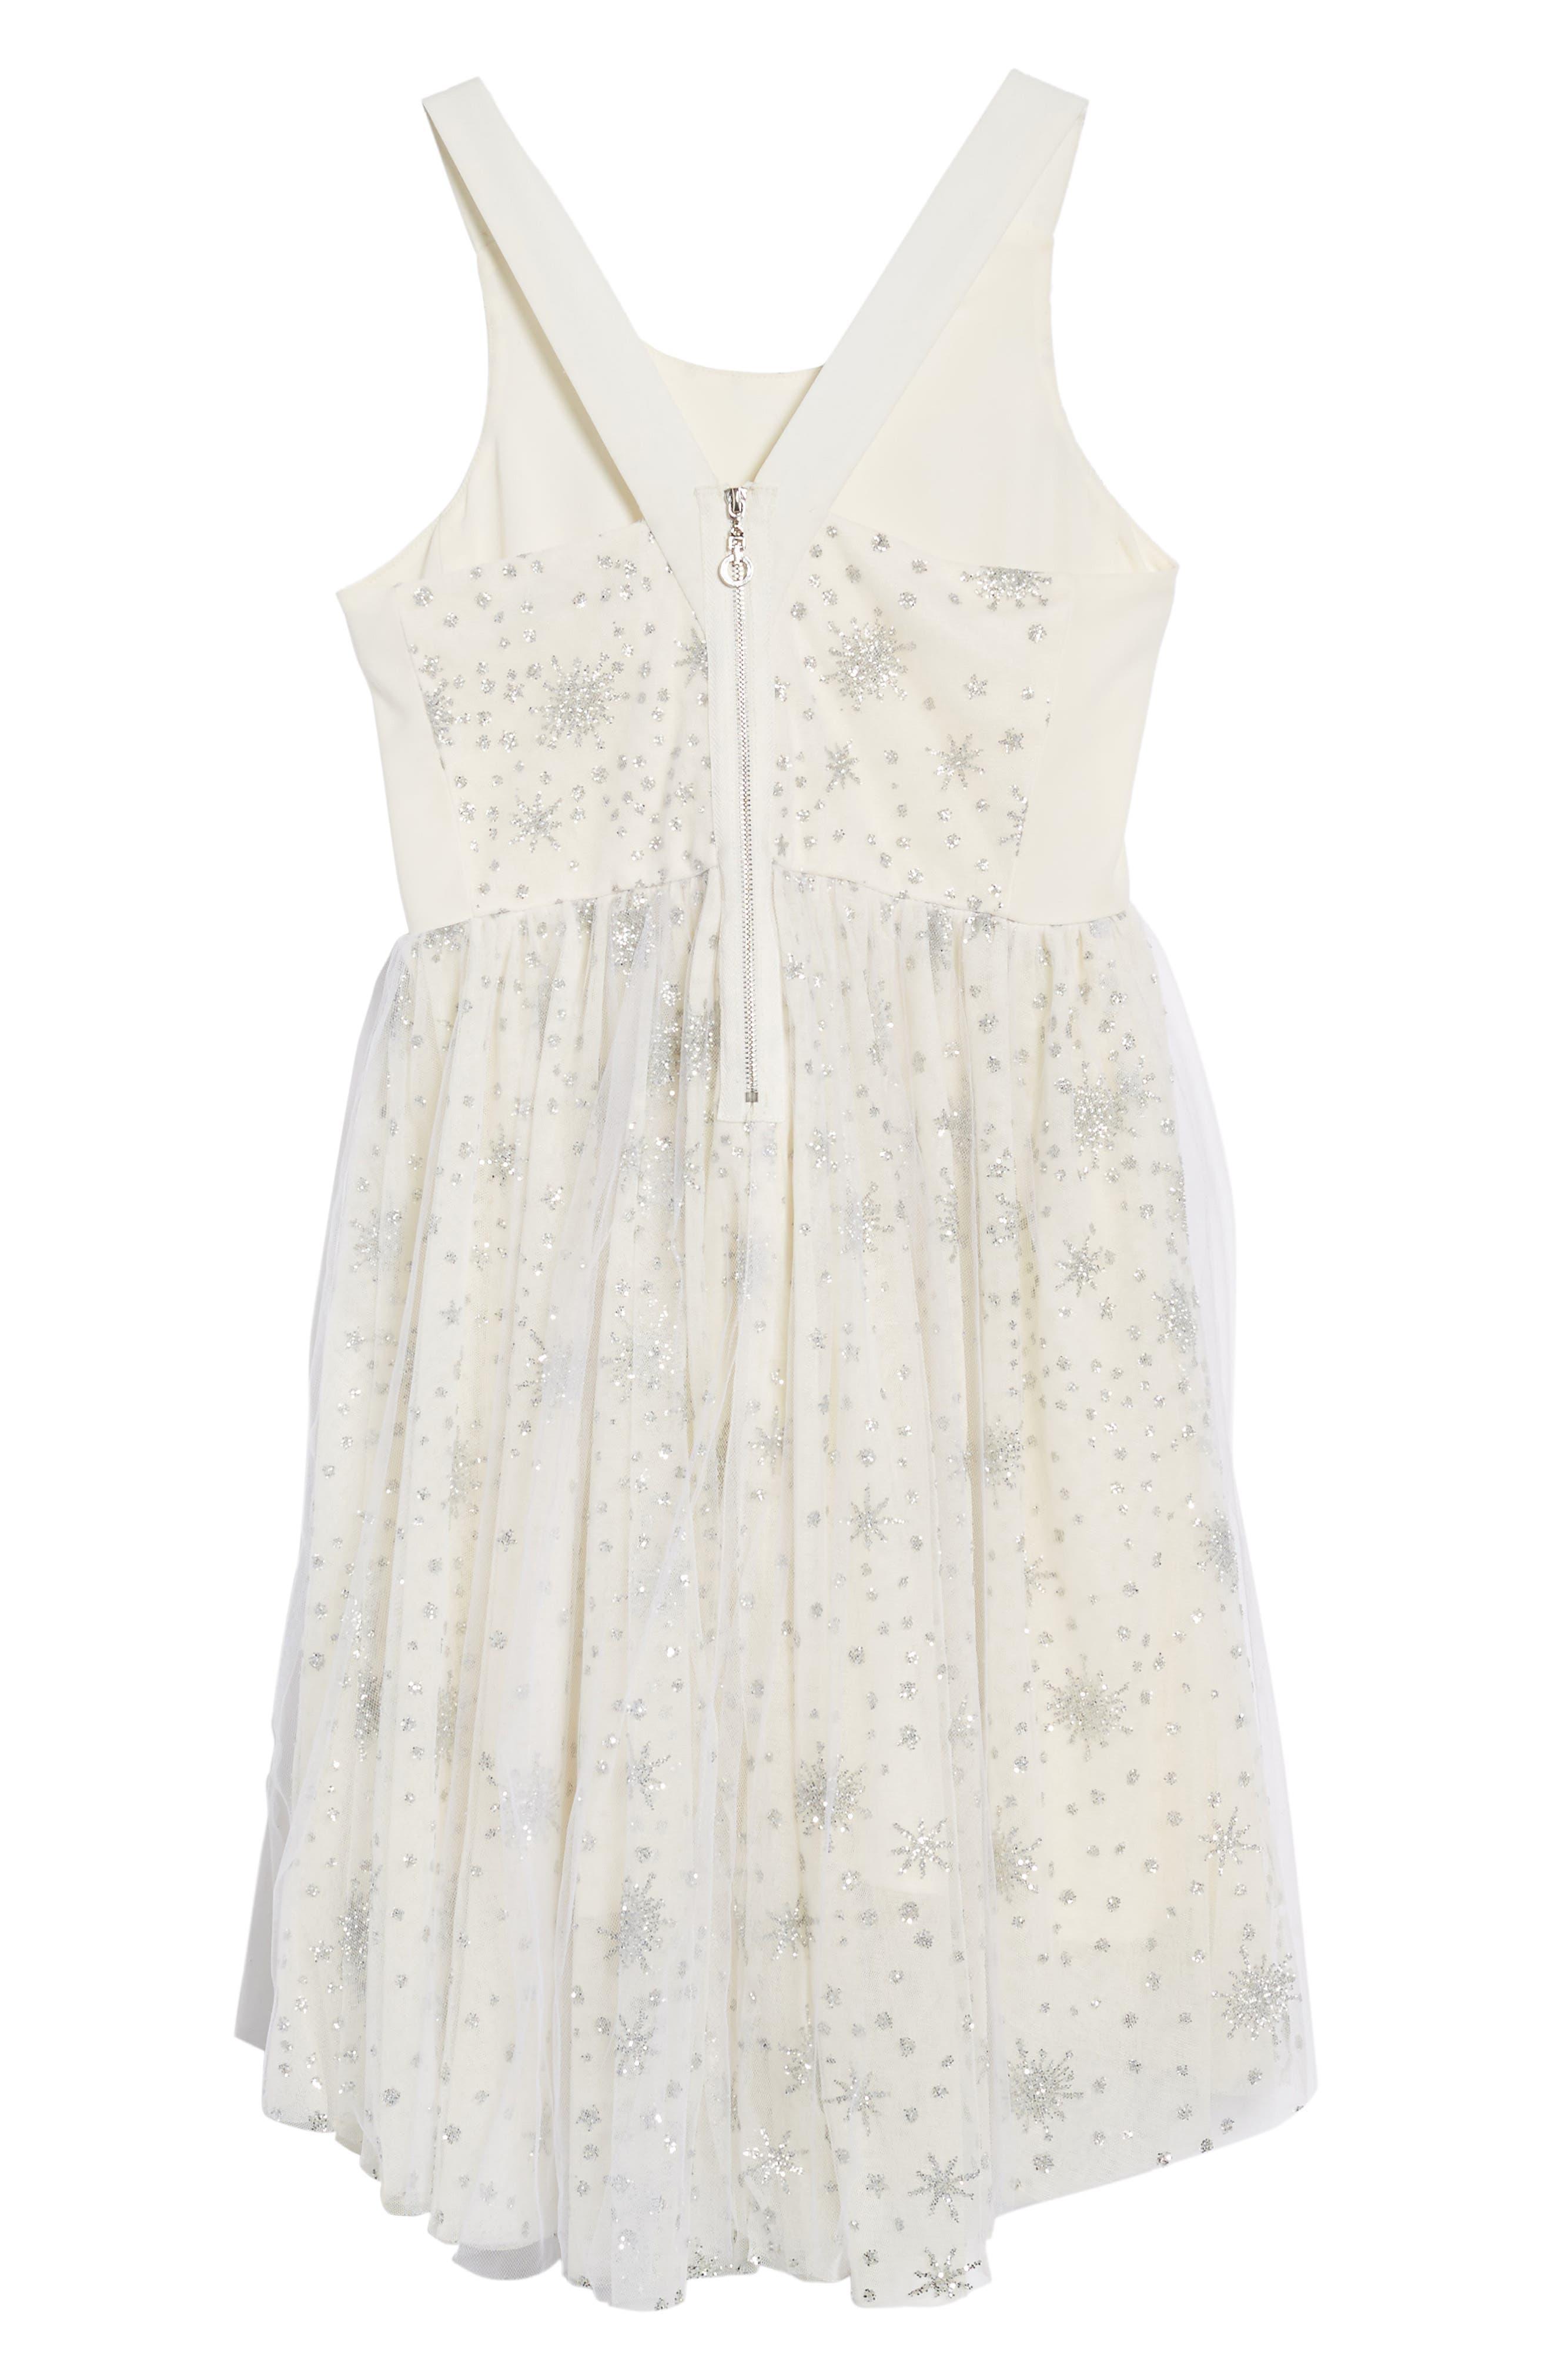 Winter Sparkle Dress,                             Alternate thumbnail 3, color,                             Cream